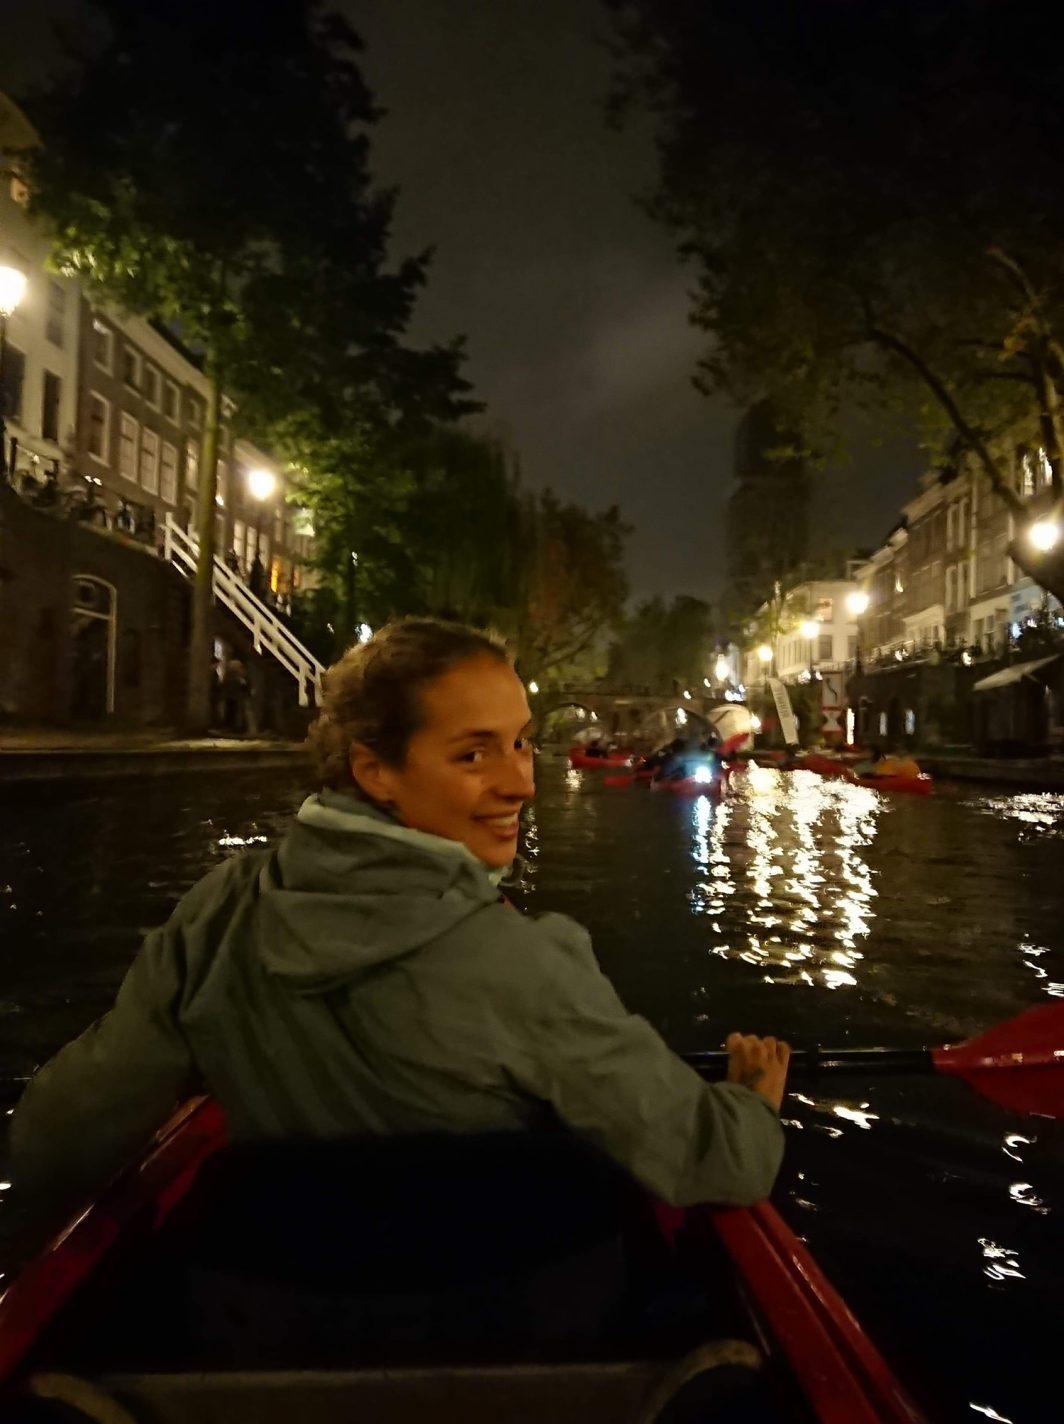 Kanoën in Utrecht - interview met Johanna